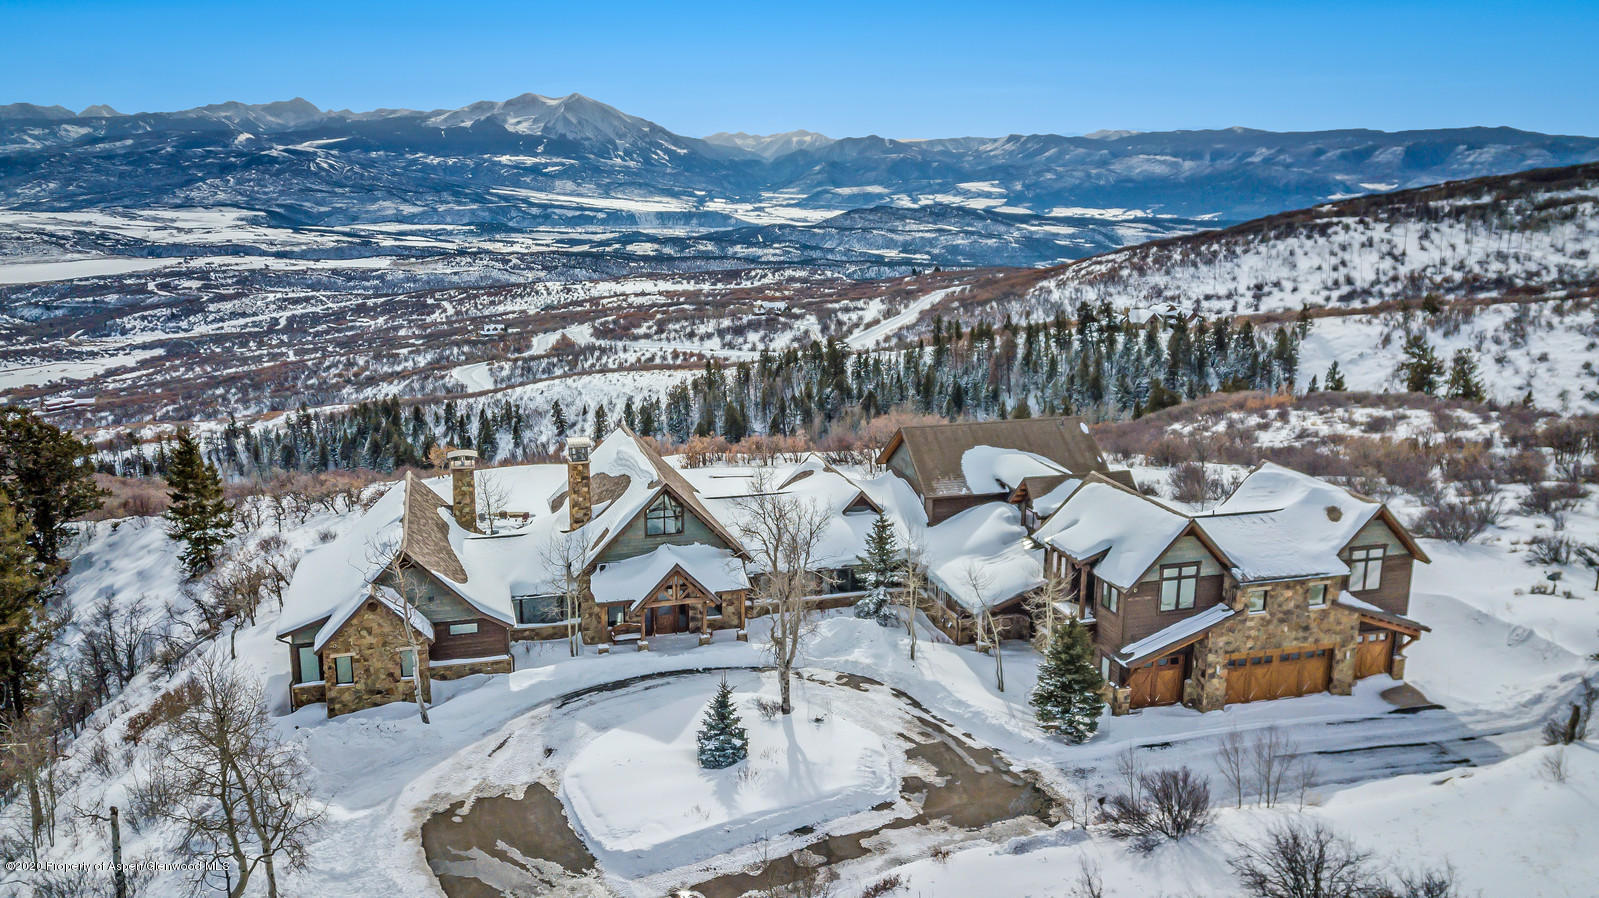 1818 Overlook Drive - Glenwood Springs, Colorado